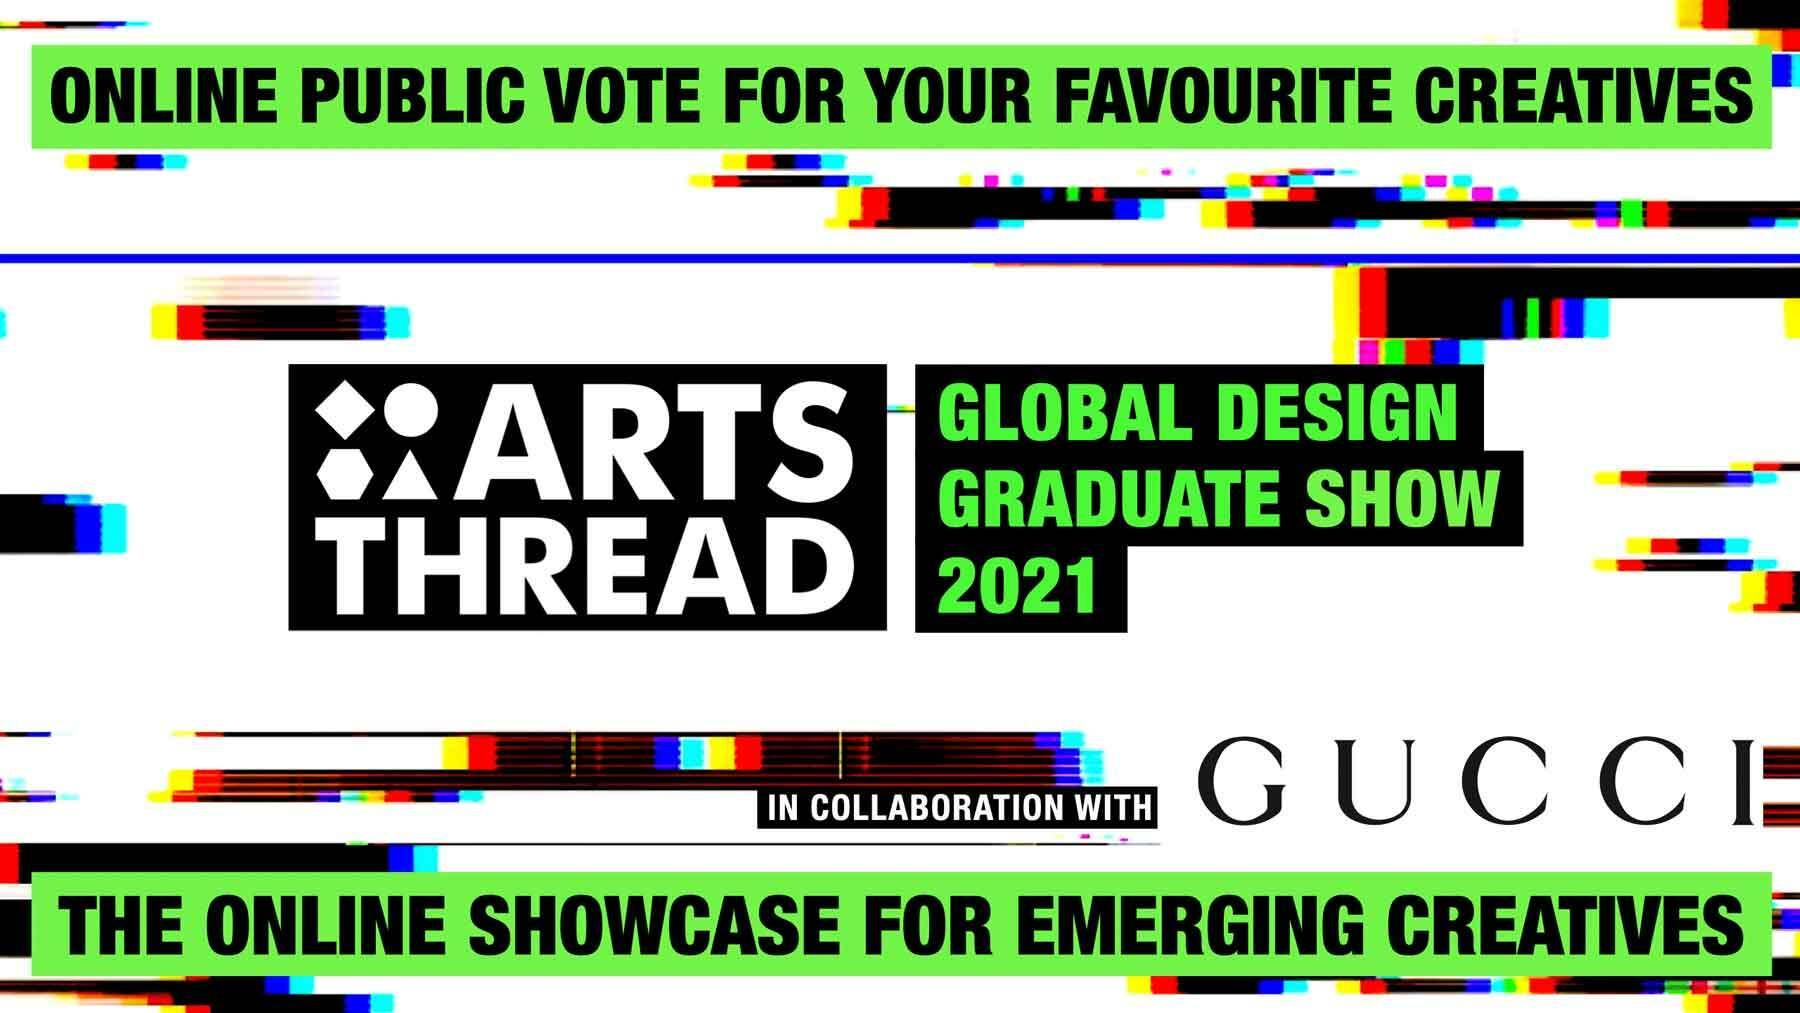 ARTSTHREAD Global Design Graduate Show 2021